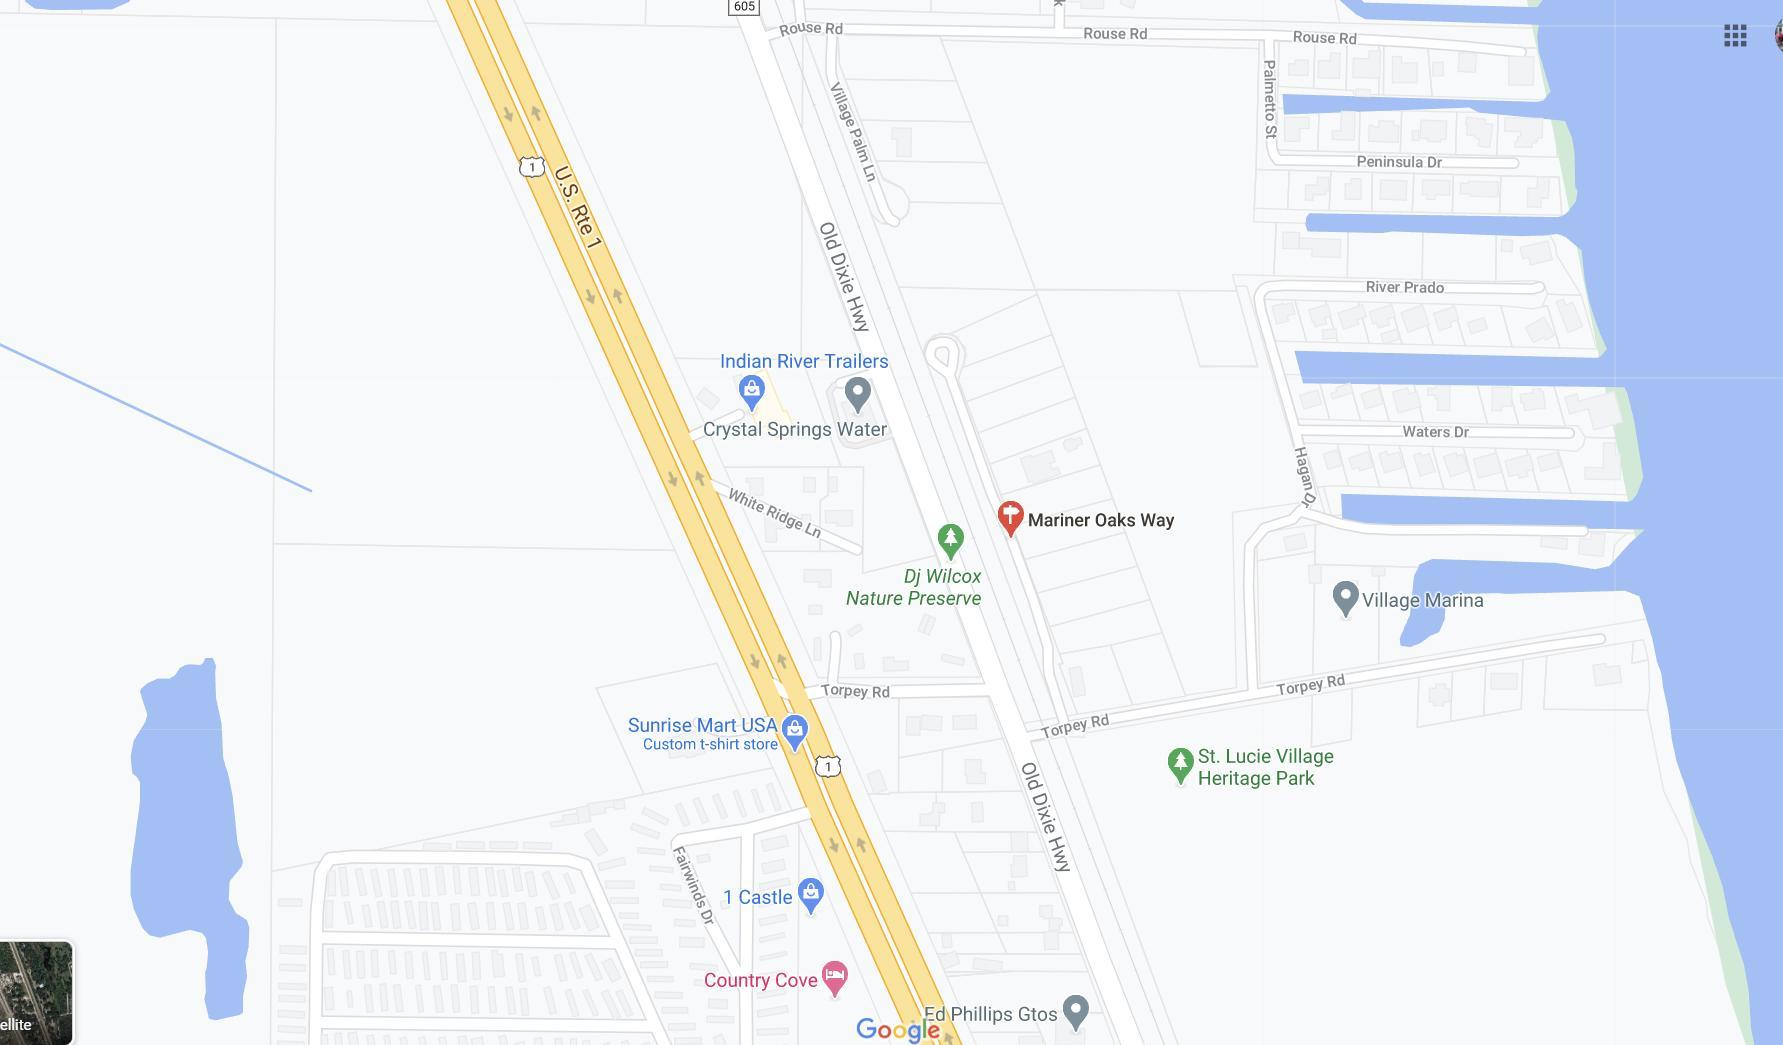 0008 Mariner Oaks Way, Fort Pierce, FL 34946